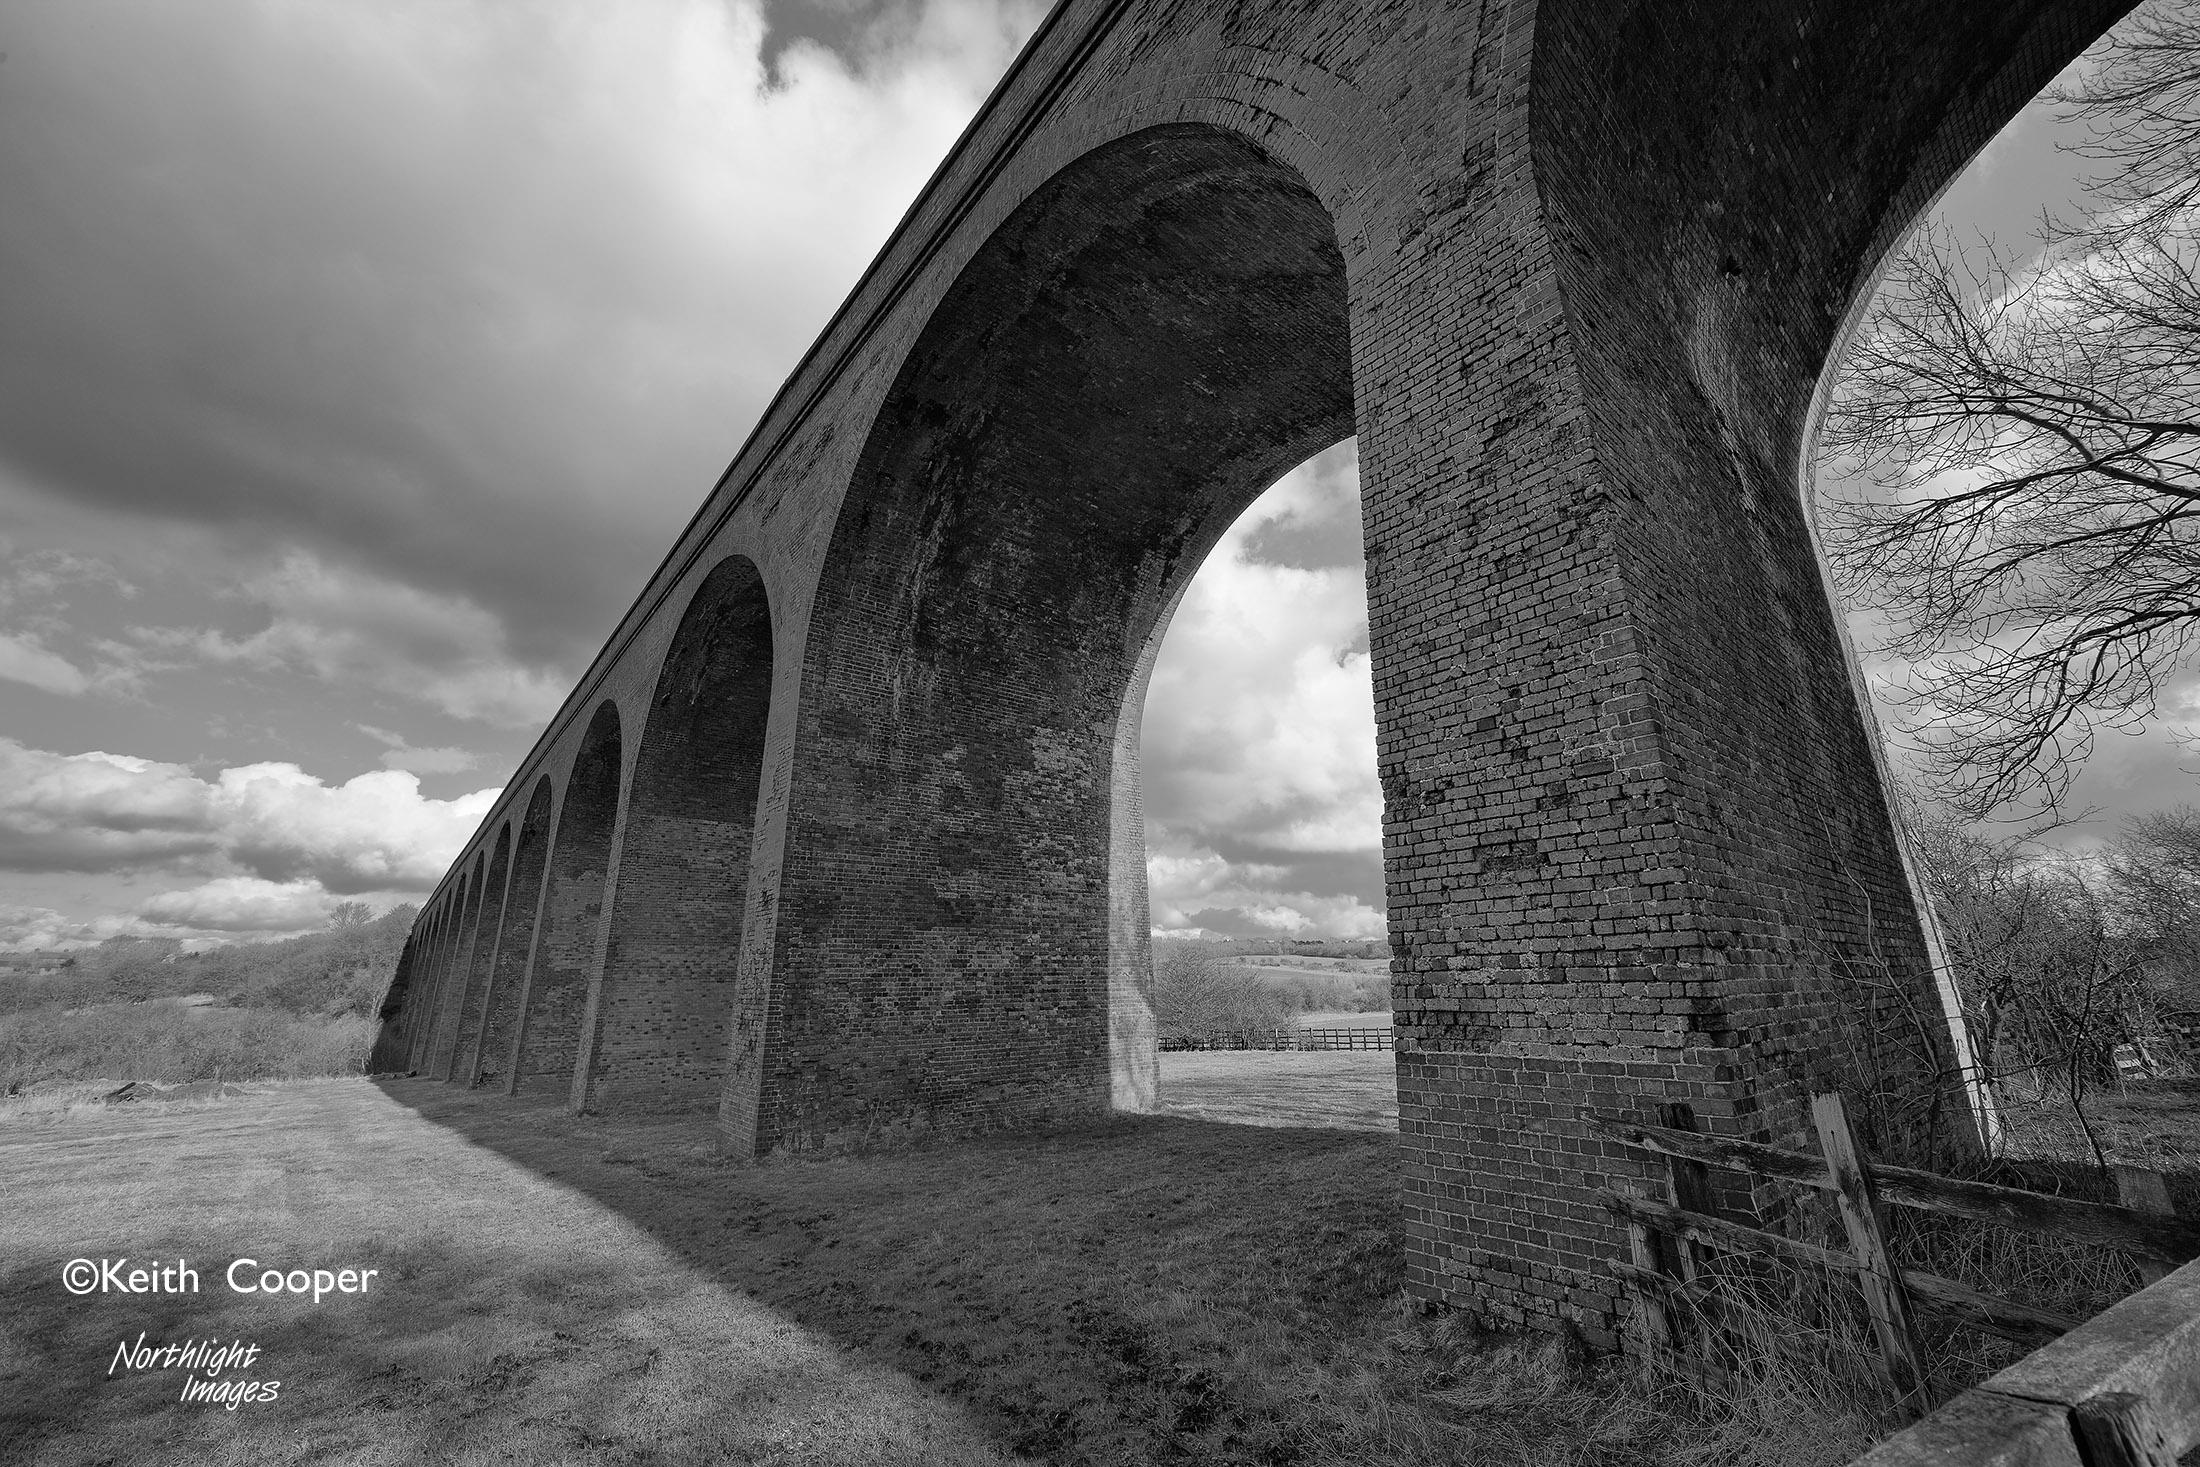 Viaduct at John O' Gaunt